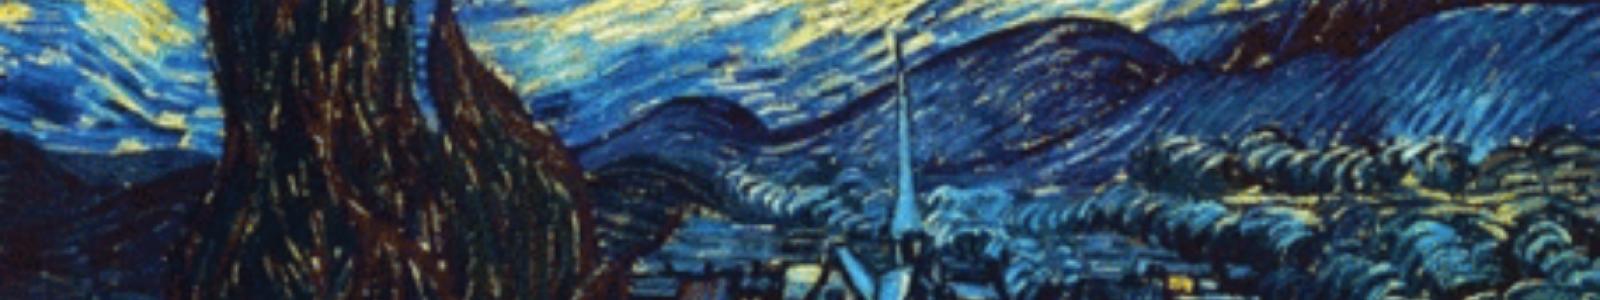 Gallery Painter Alexandro de`Ab